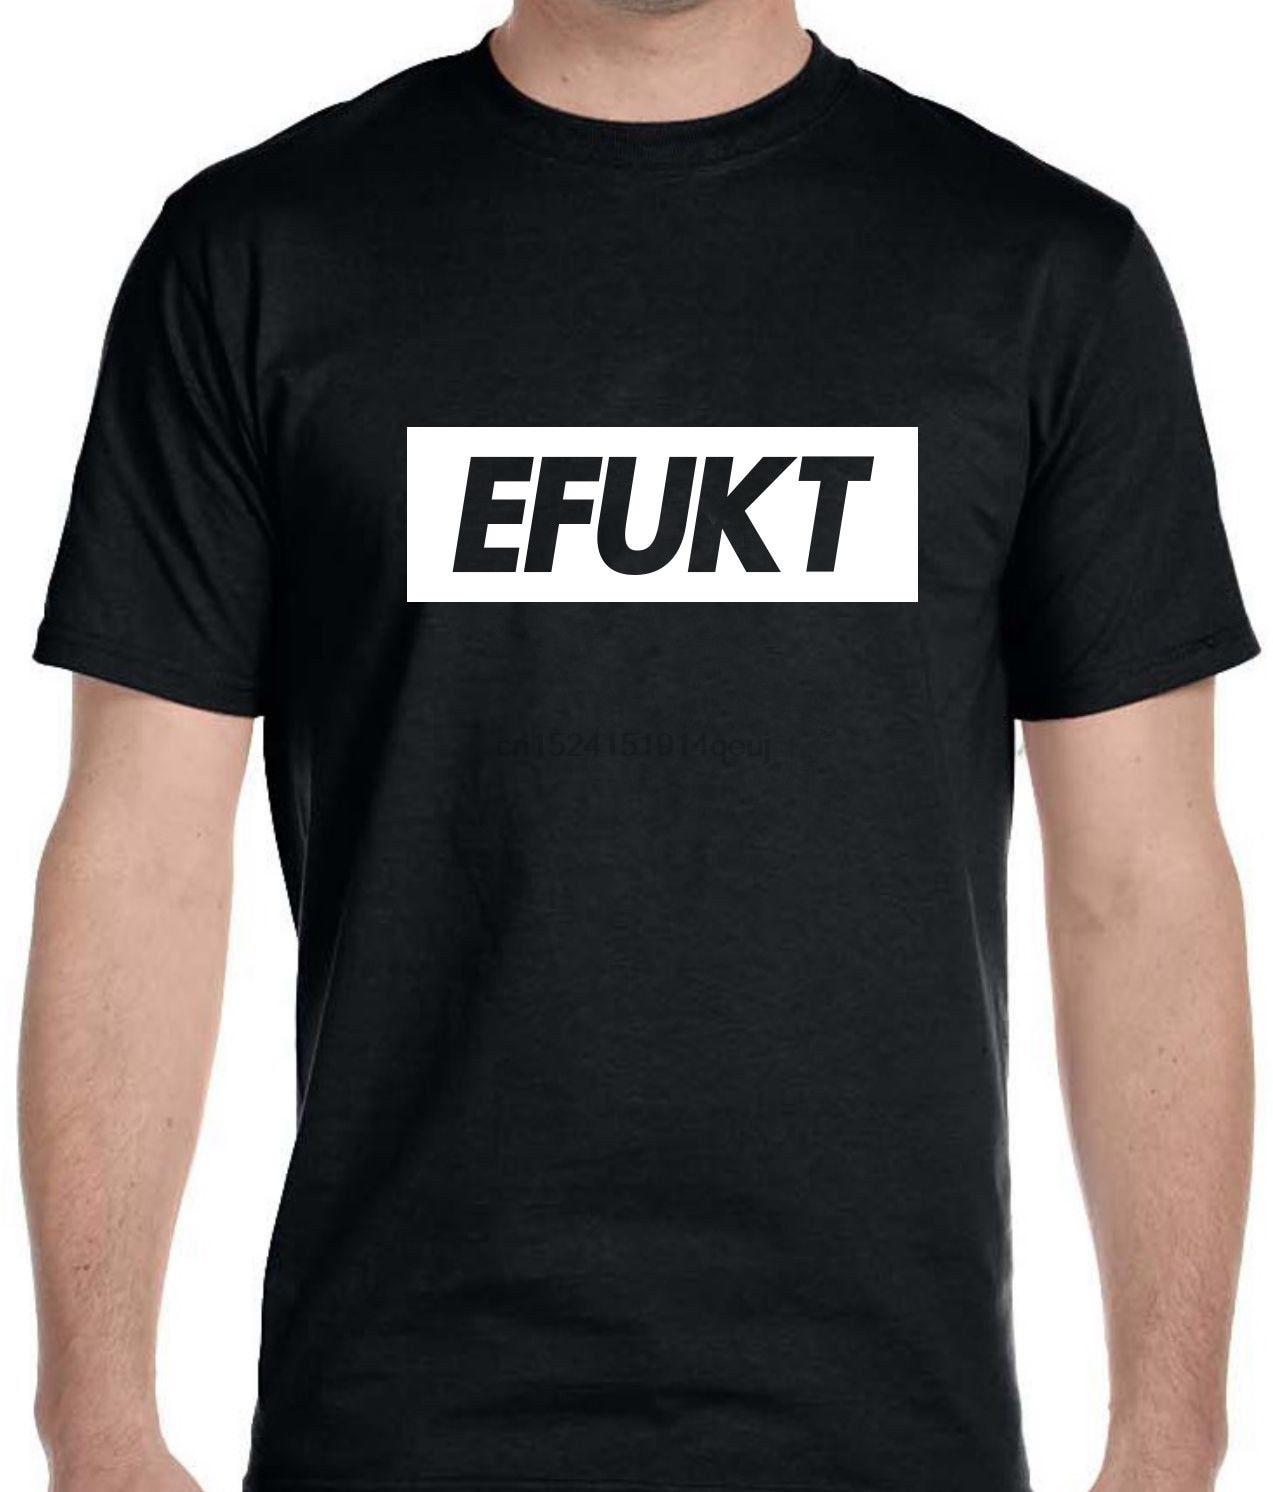 Efukt Shirts